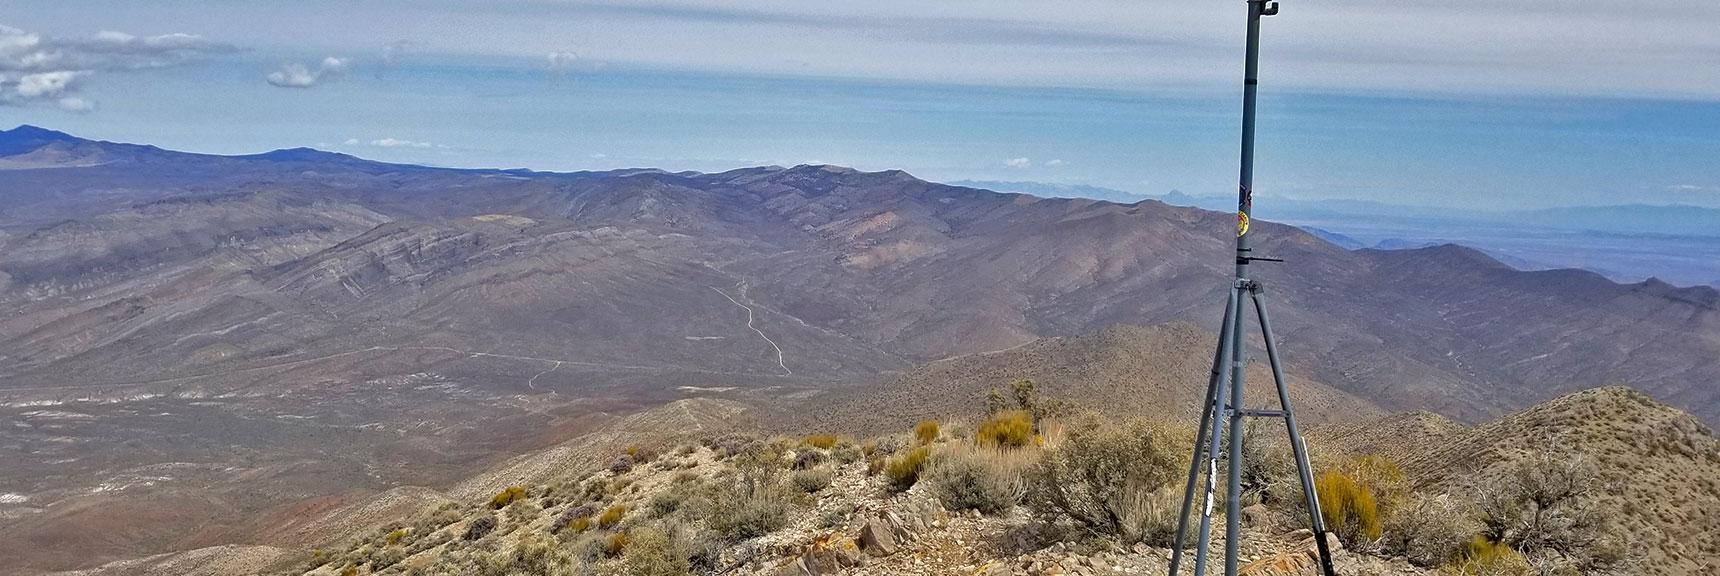 View East from Gass Peak Eastern Summit | Gass Peak Eastern Summit Ultra-marathon Adventure, Nevada